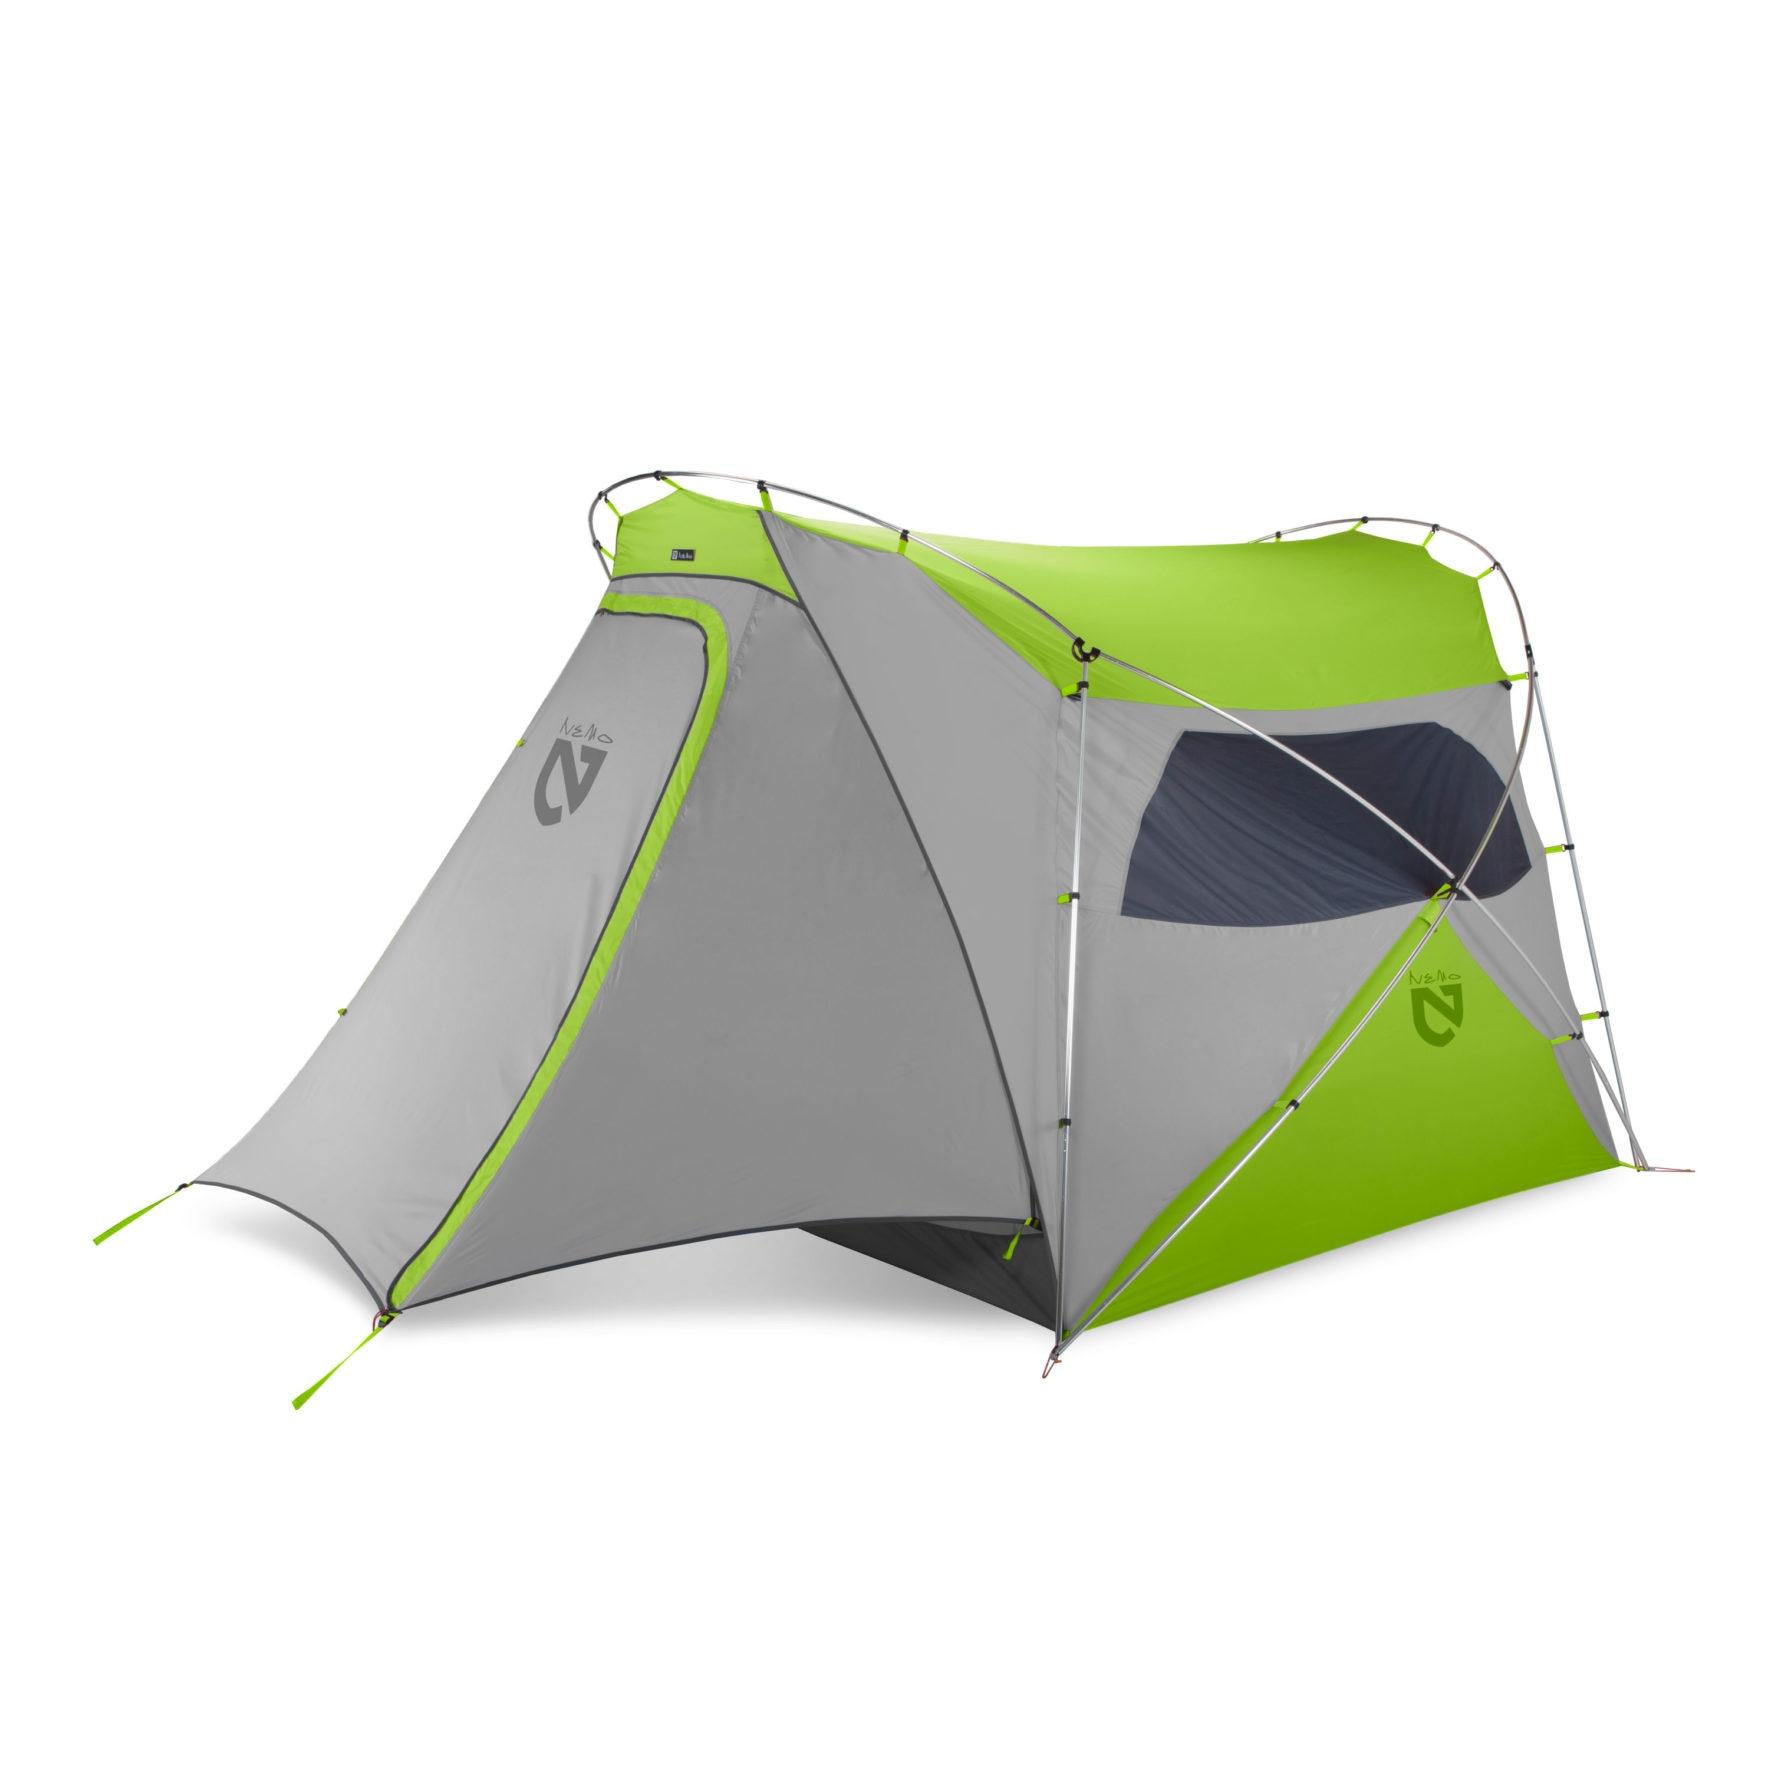 Wagontop 4P Tent - Granite/Green